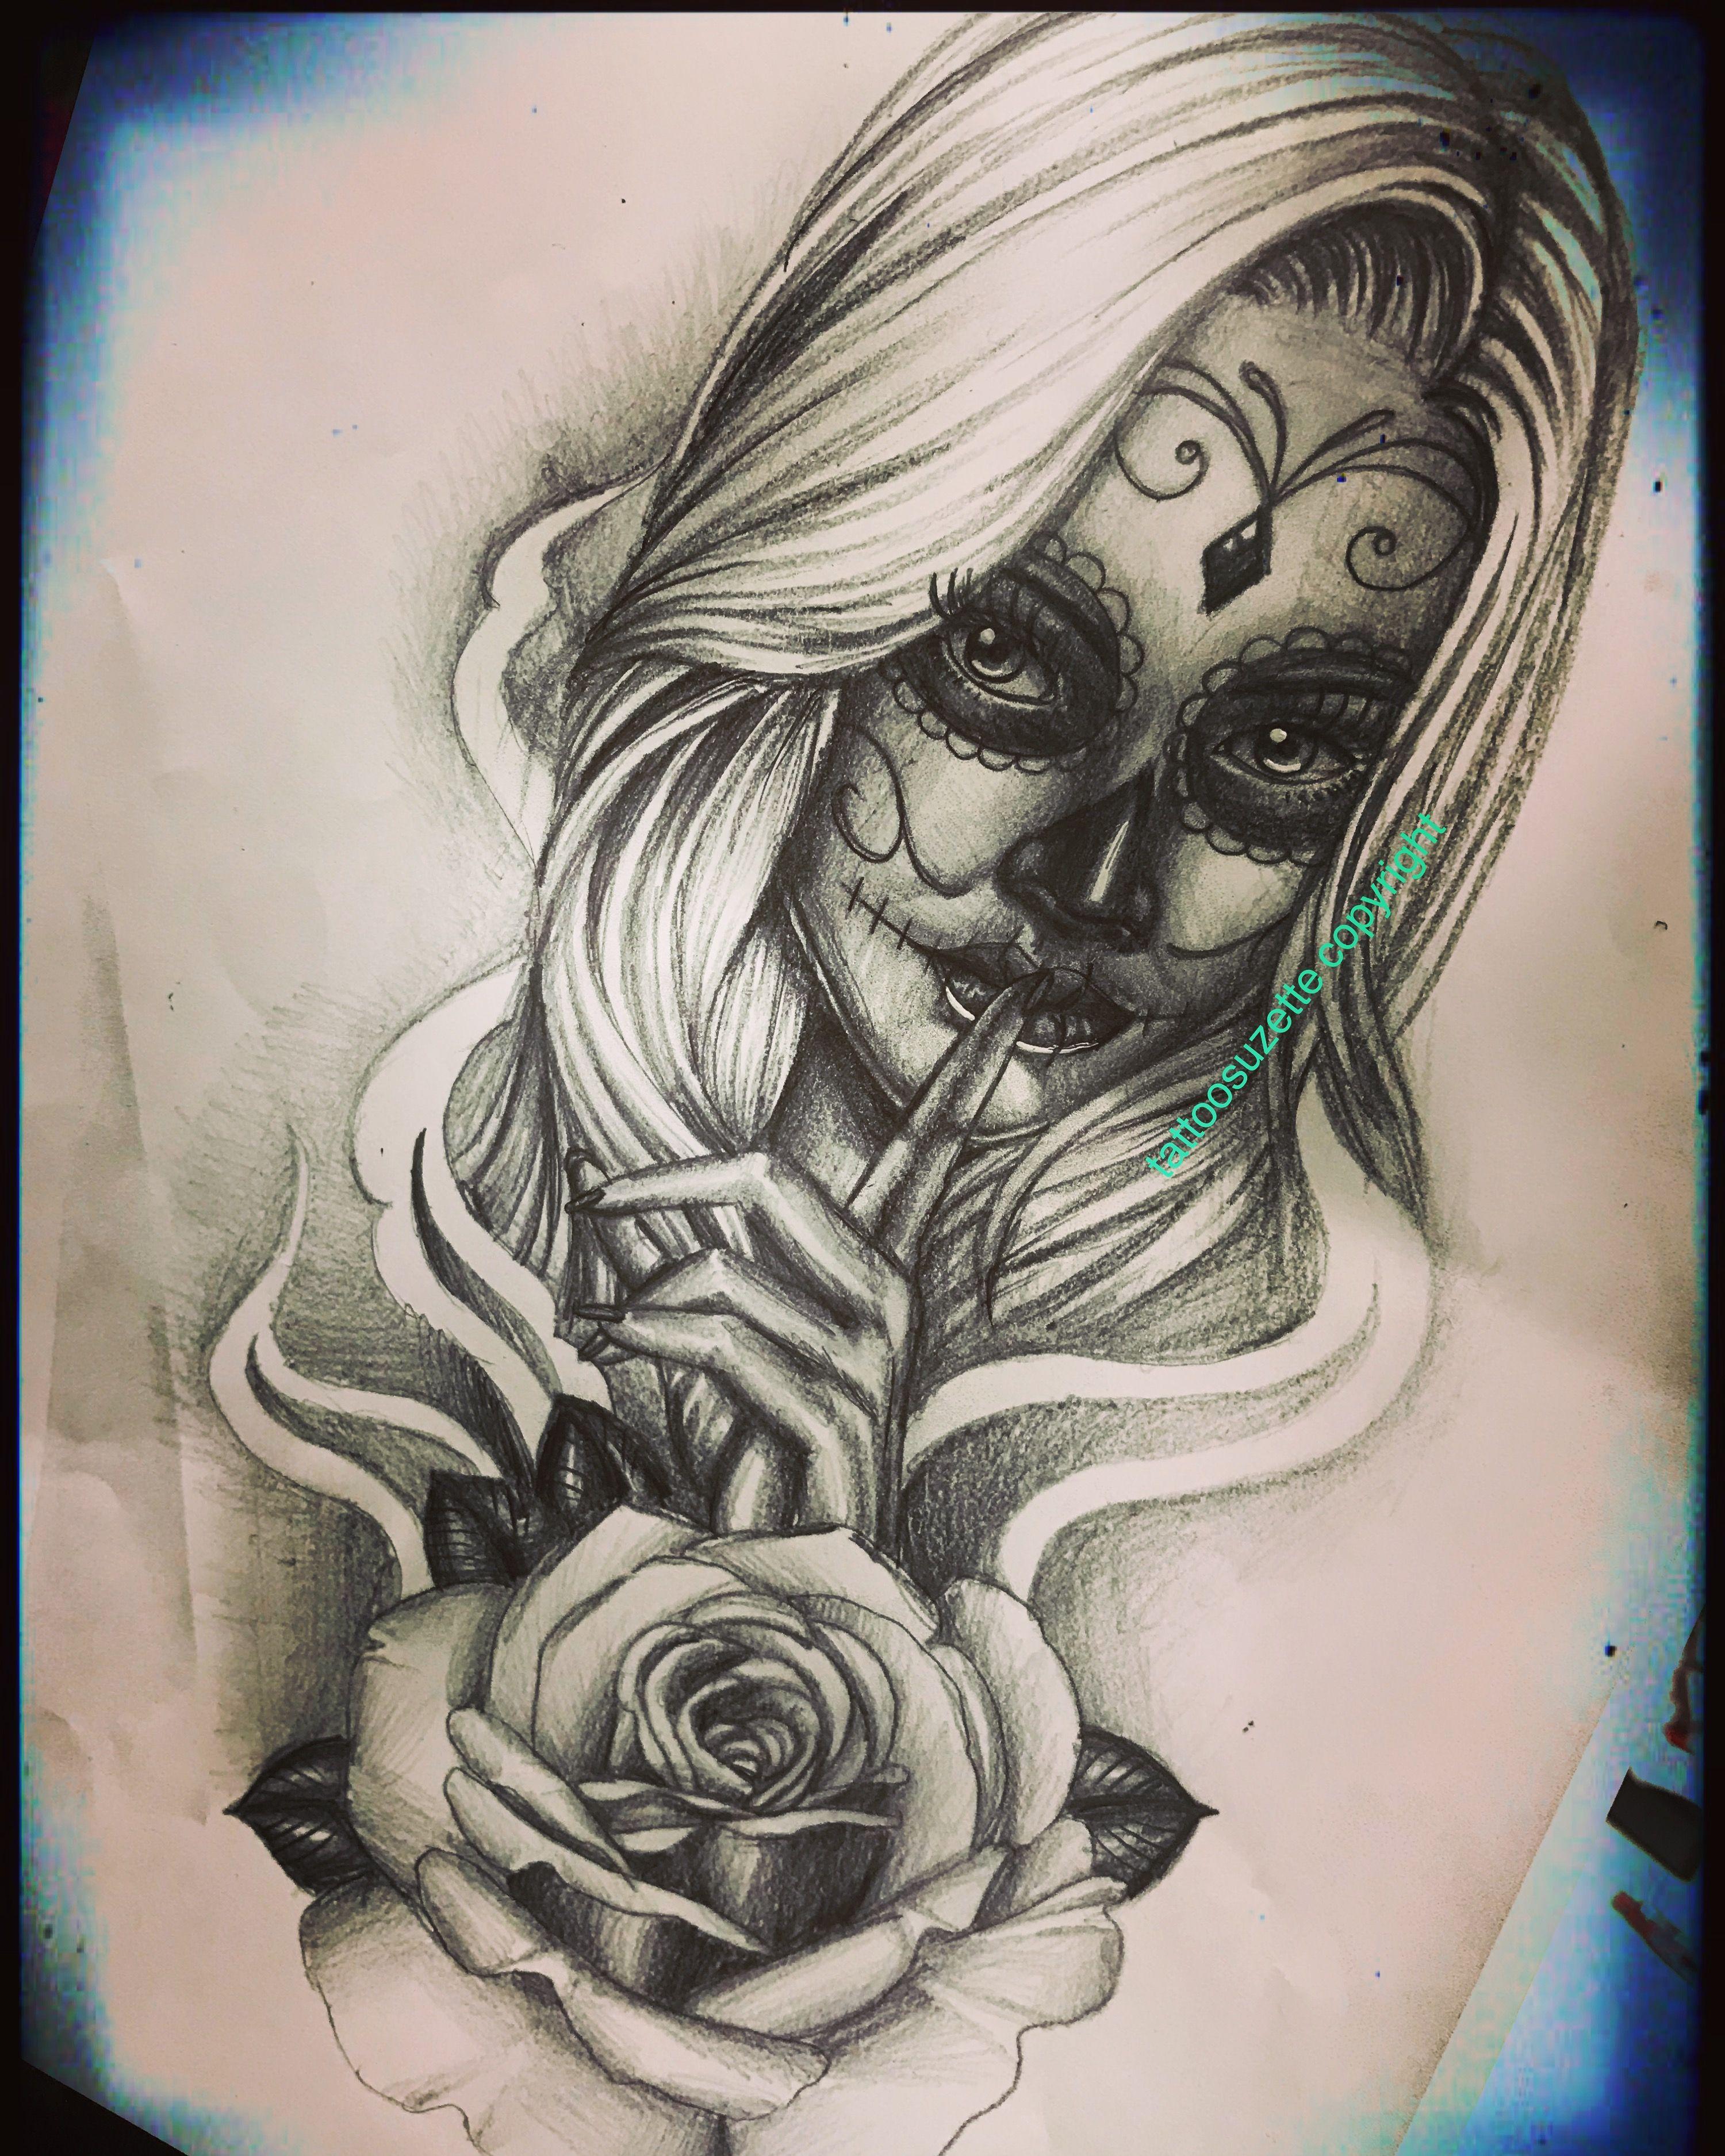 santa muerte tattoo tattoo tattoodesign tatouage catrina katrina santamuerte. Black Bedroom Furniture Sets. Home Design Ideas